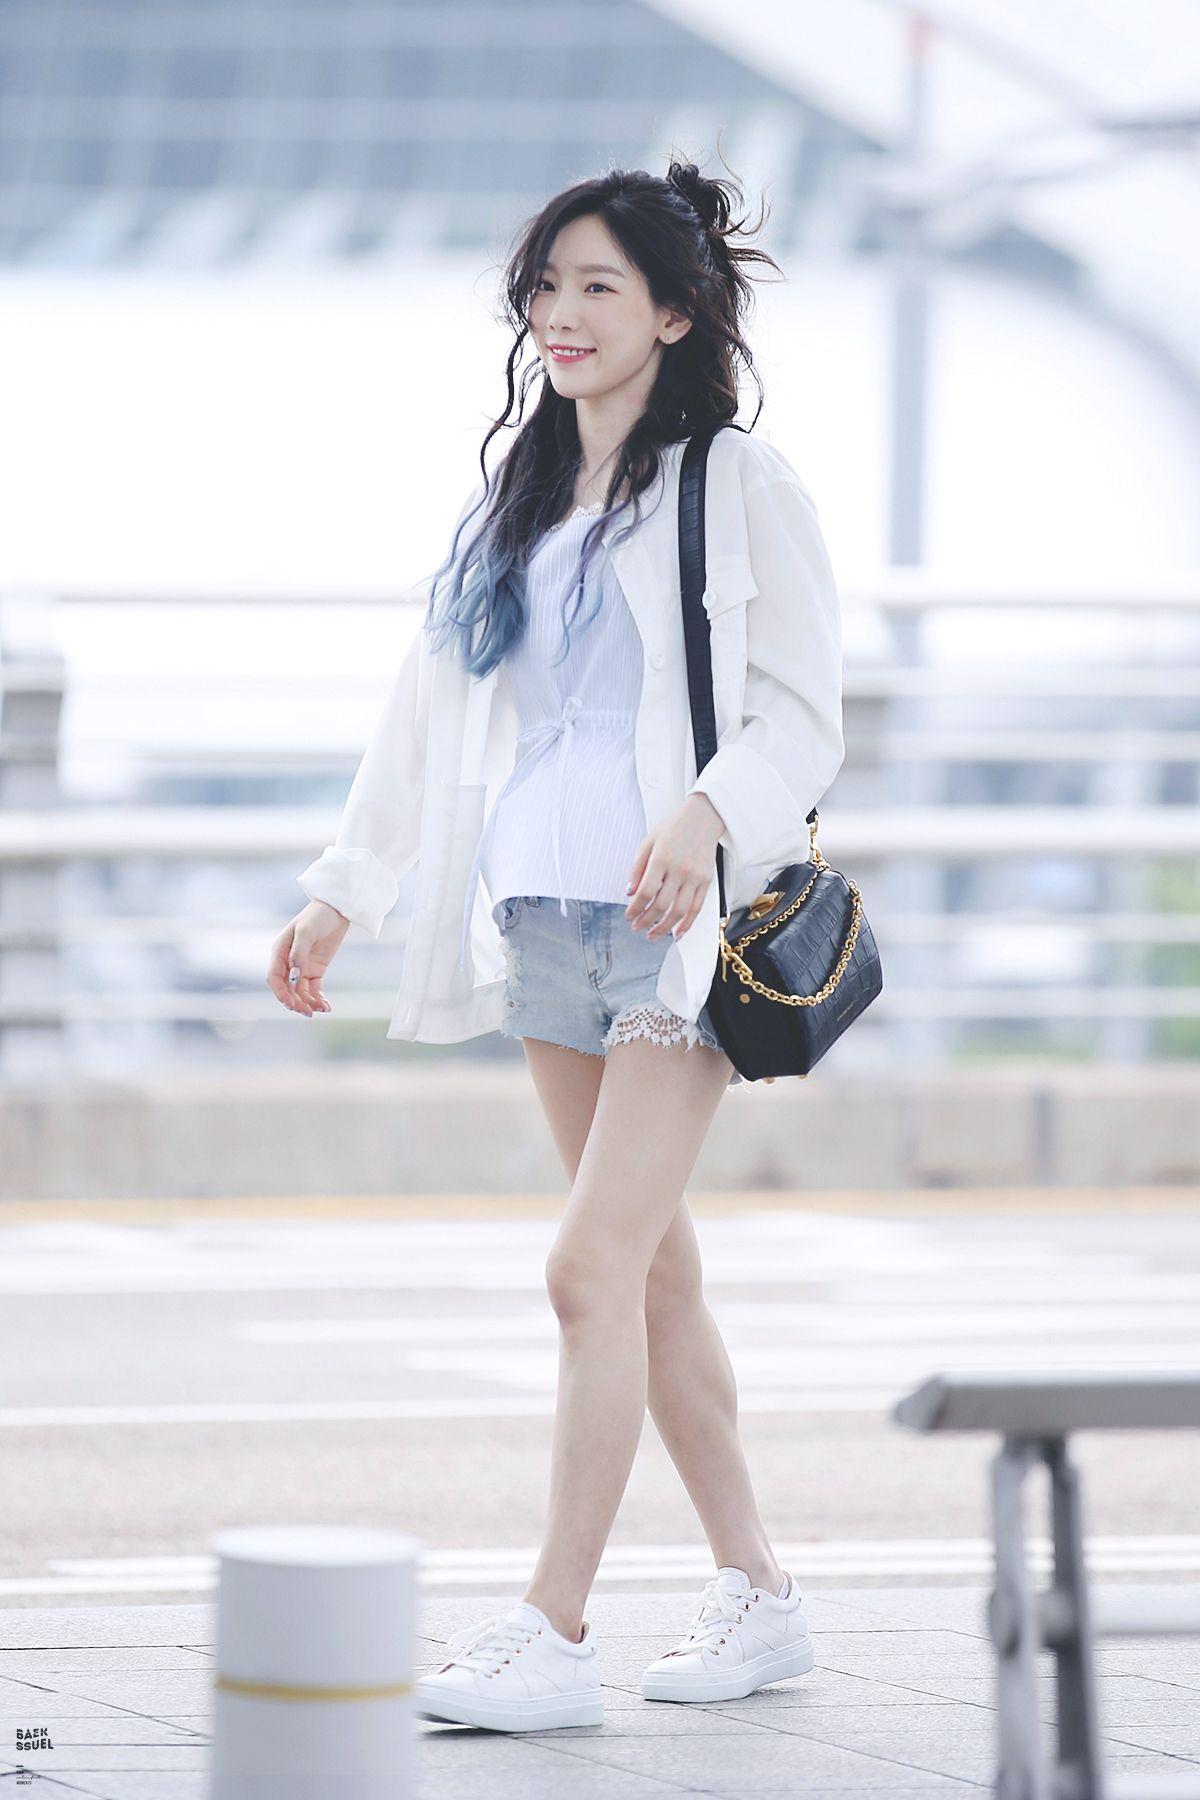 Artis Korea Ke Airport Pun Tetap Stylish Dan Fashionable Banget Spice